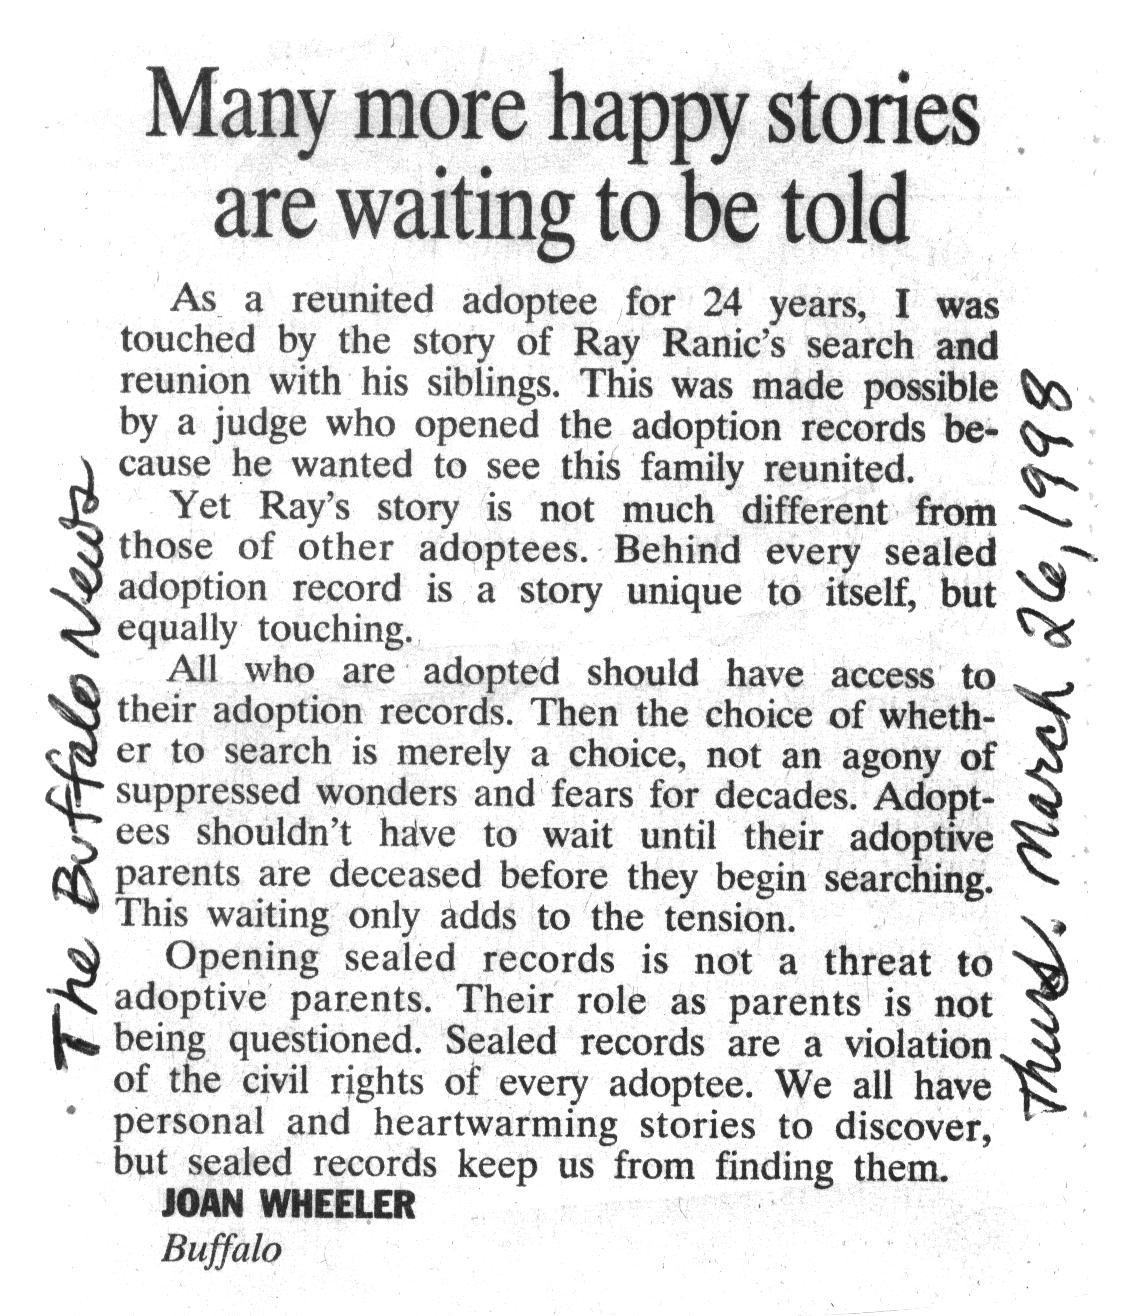 1976 2000 the buffalo news forbidden family 18 manymorehappystoriesarewaitingtobetold 3 26 1998 aiddatafo Image collections